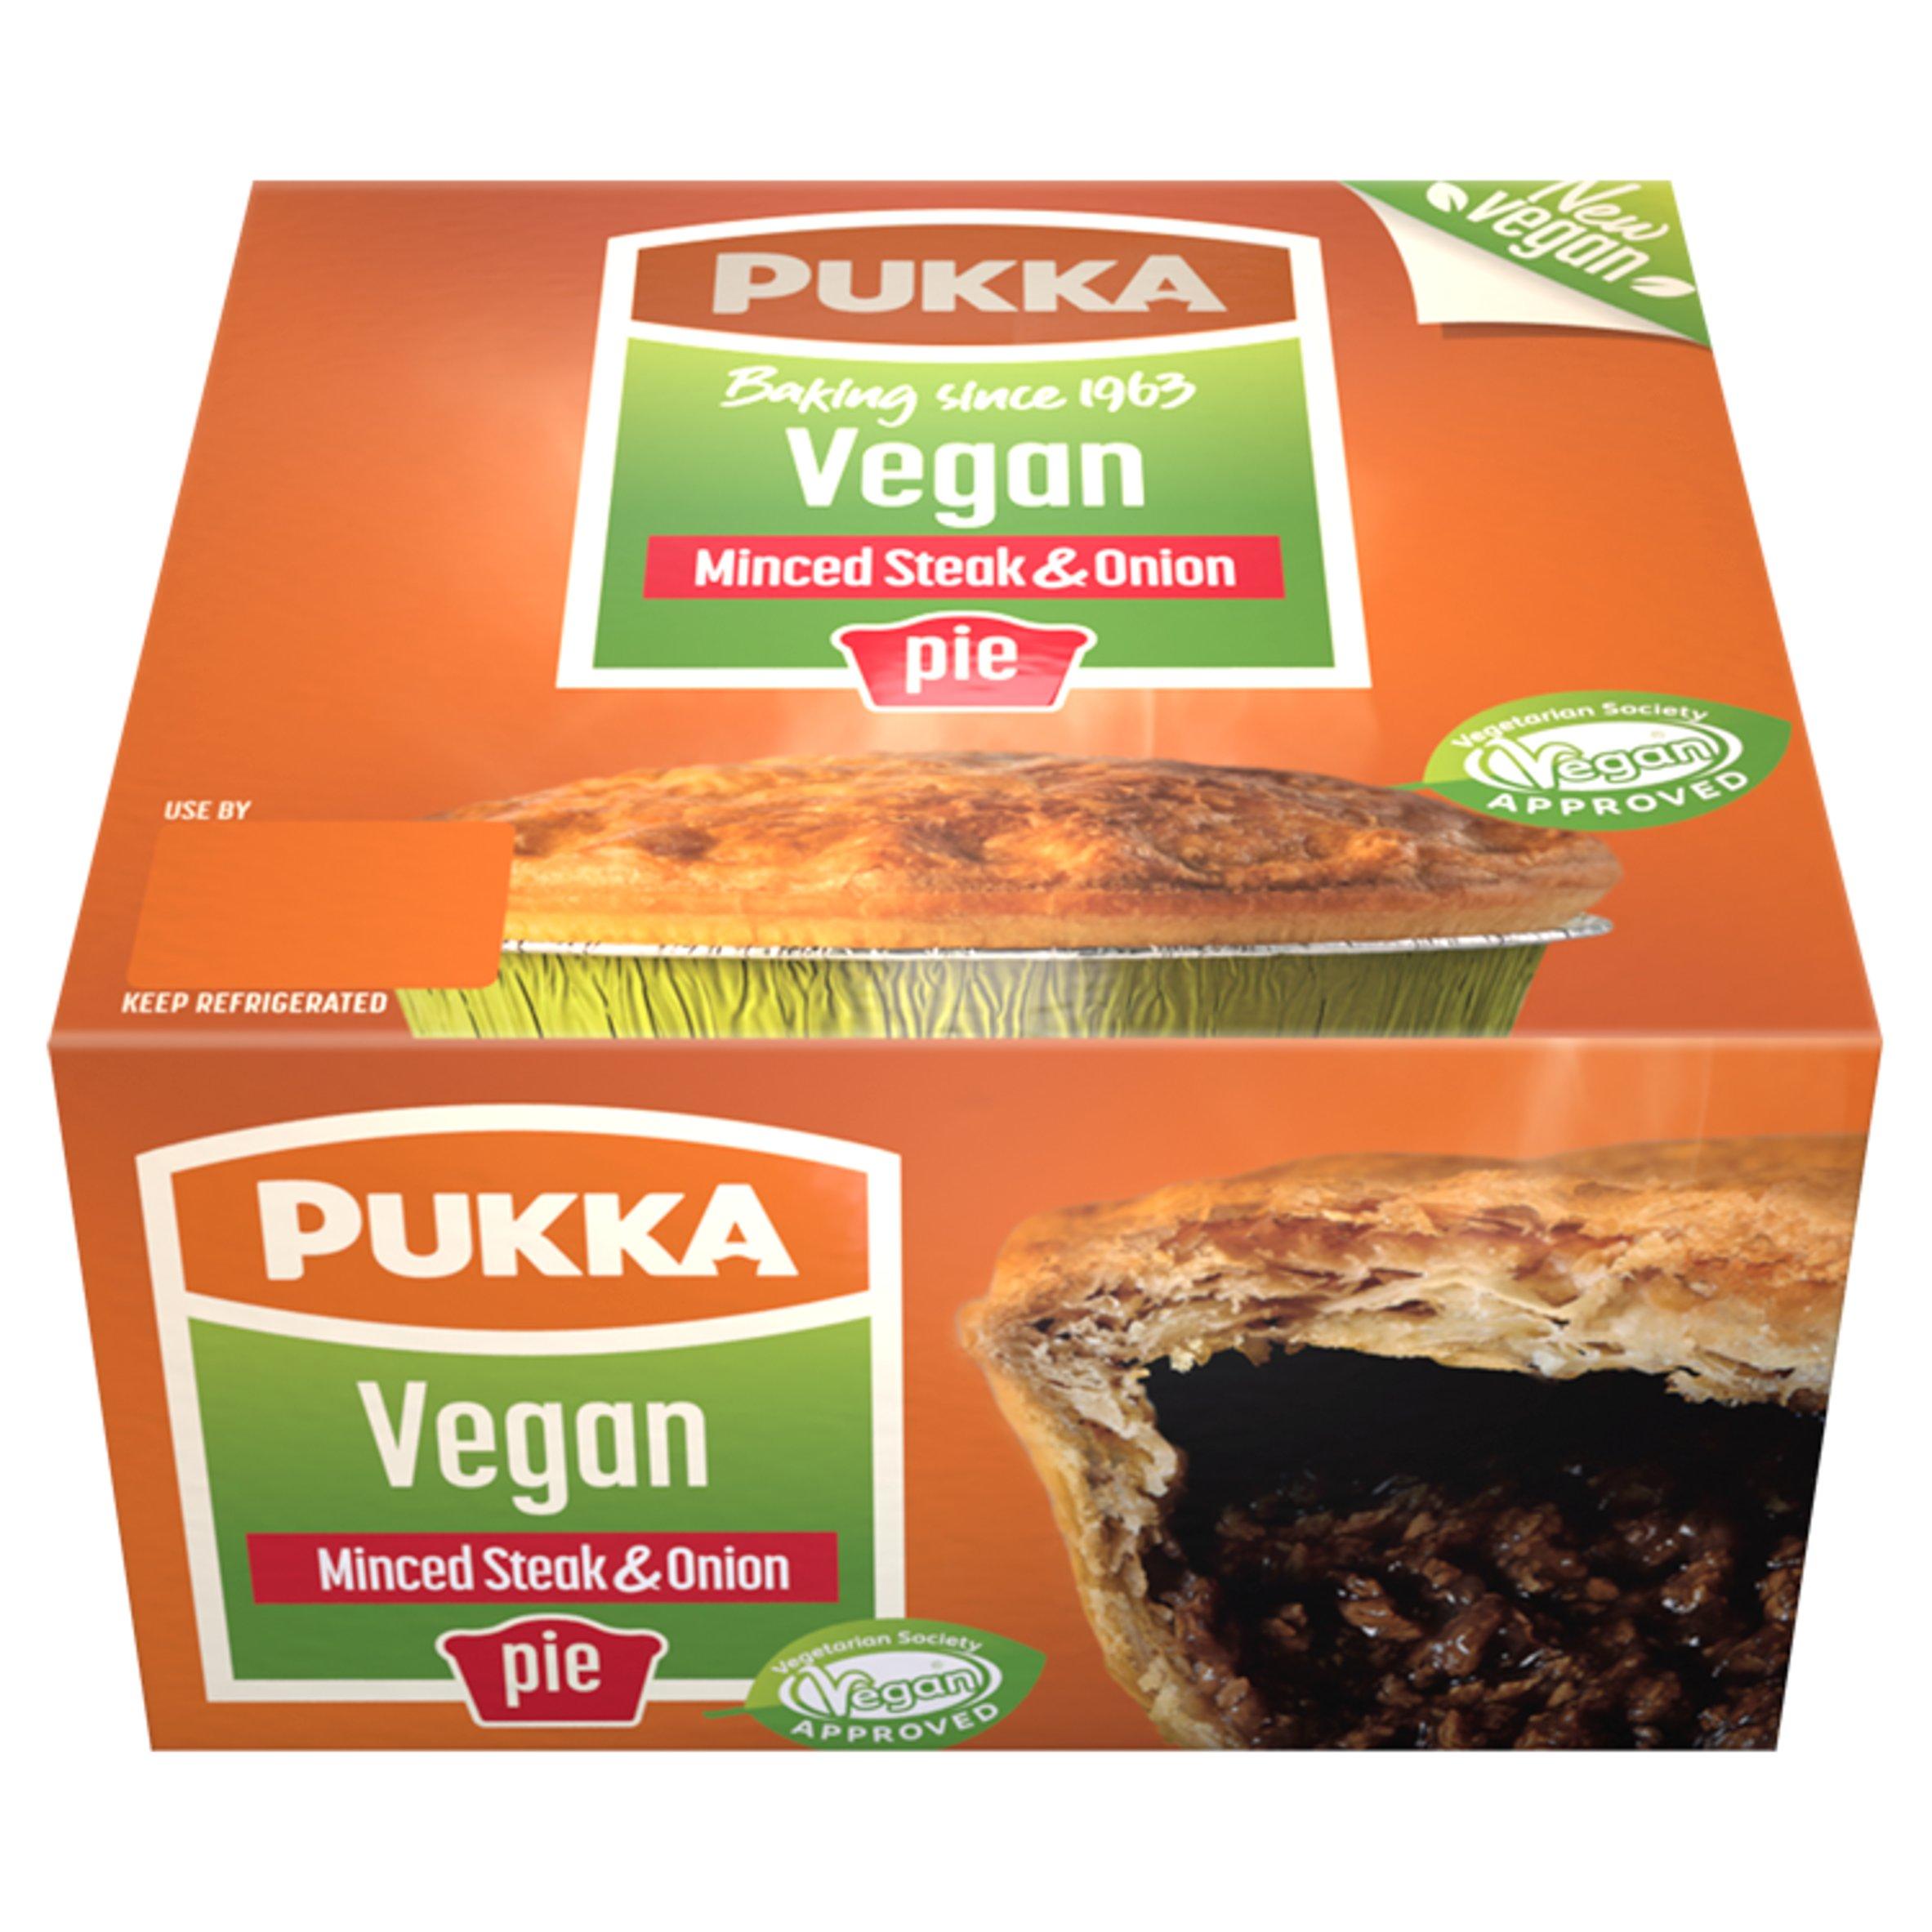 Pukka Vegan Minced Beef & Onion Pie